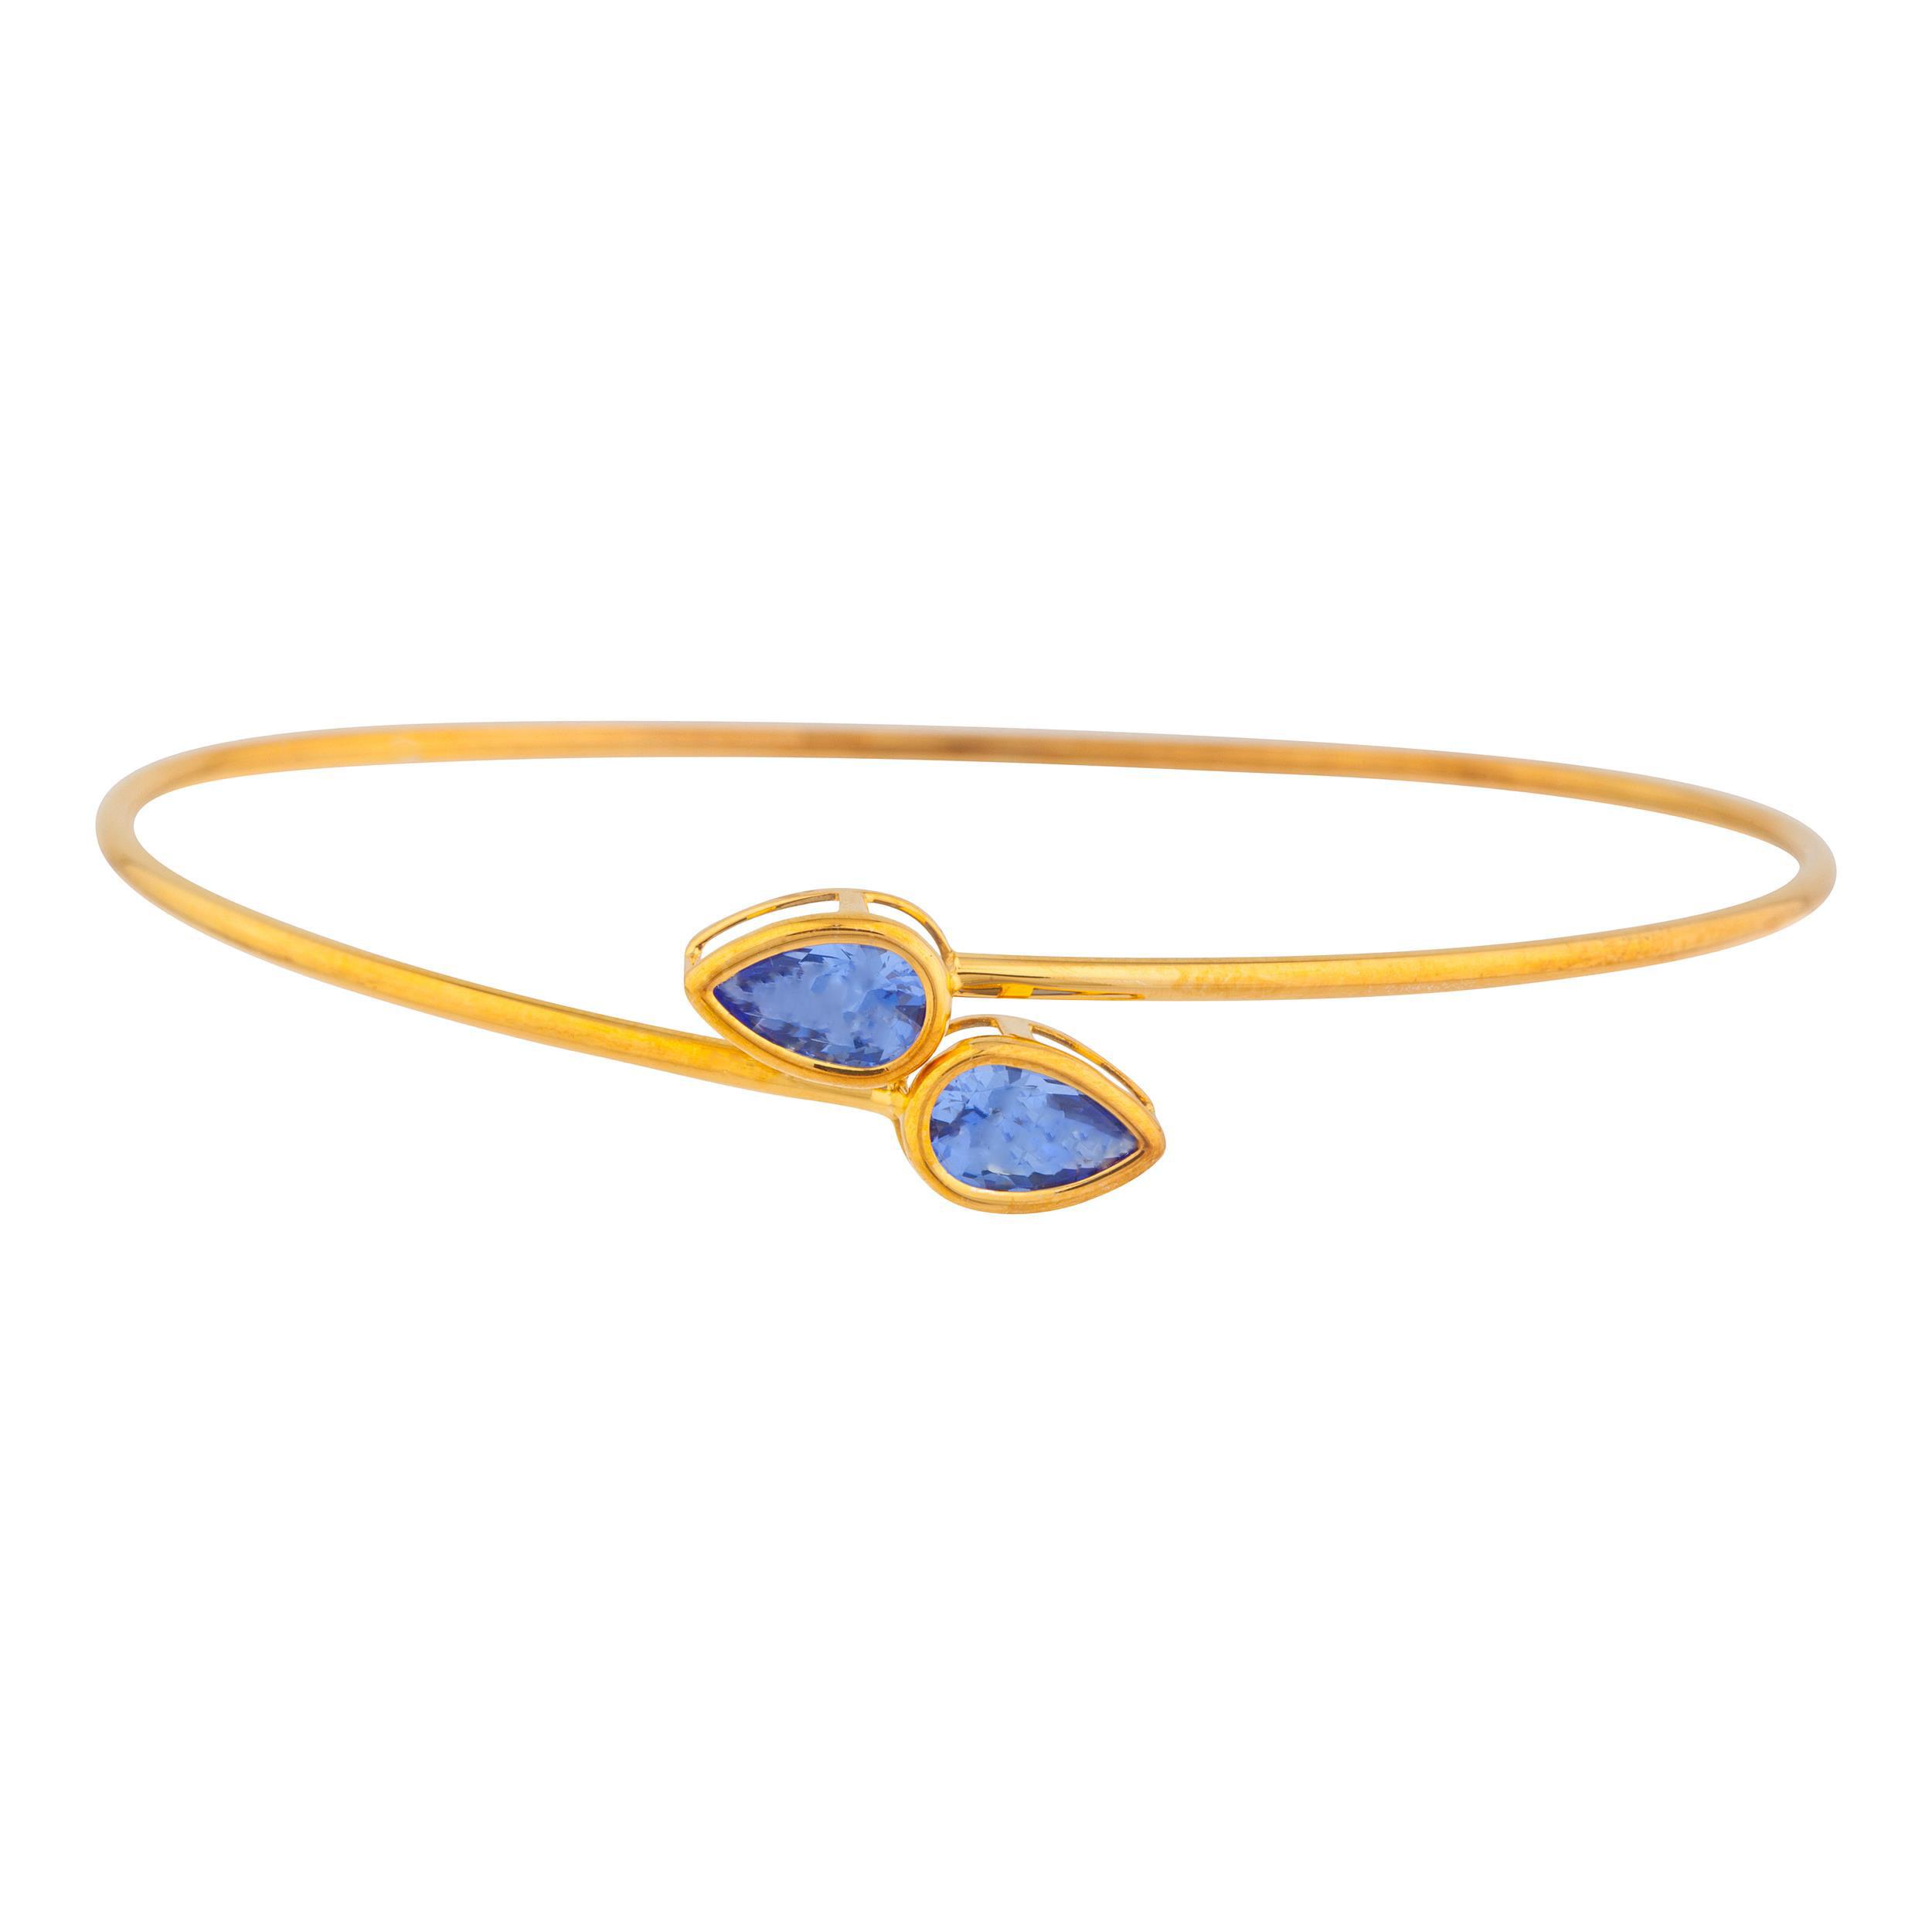 14Kt Yellow Gold Plated Tanzanite Pear Bezel Bangle Bracelet by Elizabeth Jewelry Inc